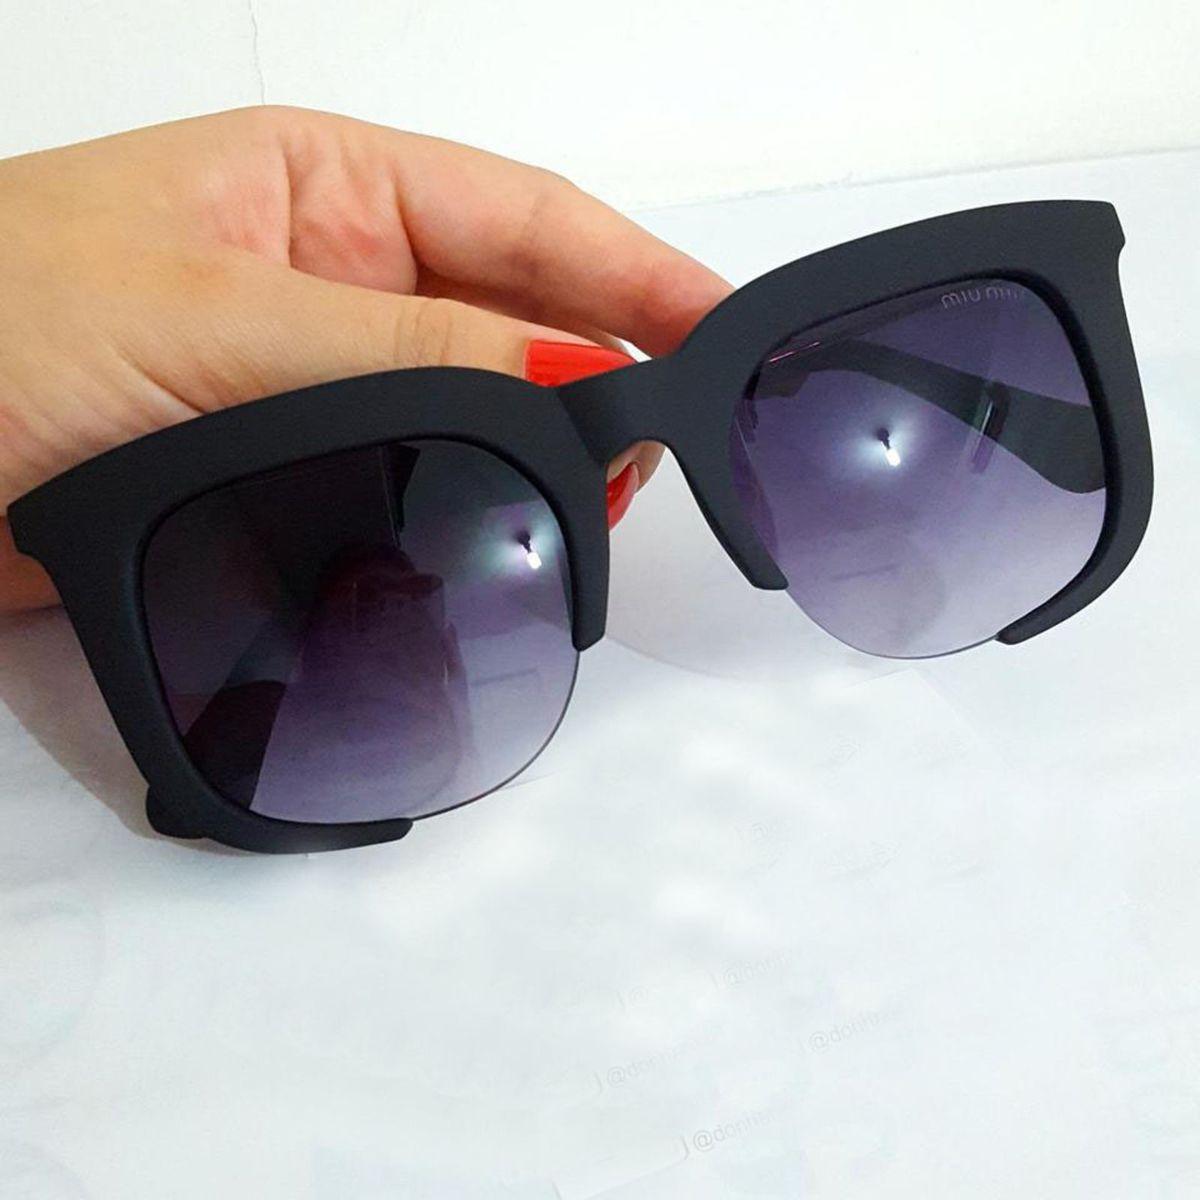 óculos de sol miu miu rasoir - óculos miu miu.  Czm6ly9wag90b3muzw5qb2vplmnvbs5ici9wcm9kdwn0cy84ntm0nzg2l2mxnza4ytbiy2e2njzjmtrkogrizjlinmvlzdlmyzvhlmpwzw  ... 43d330ef39